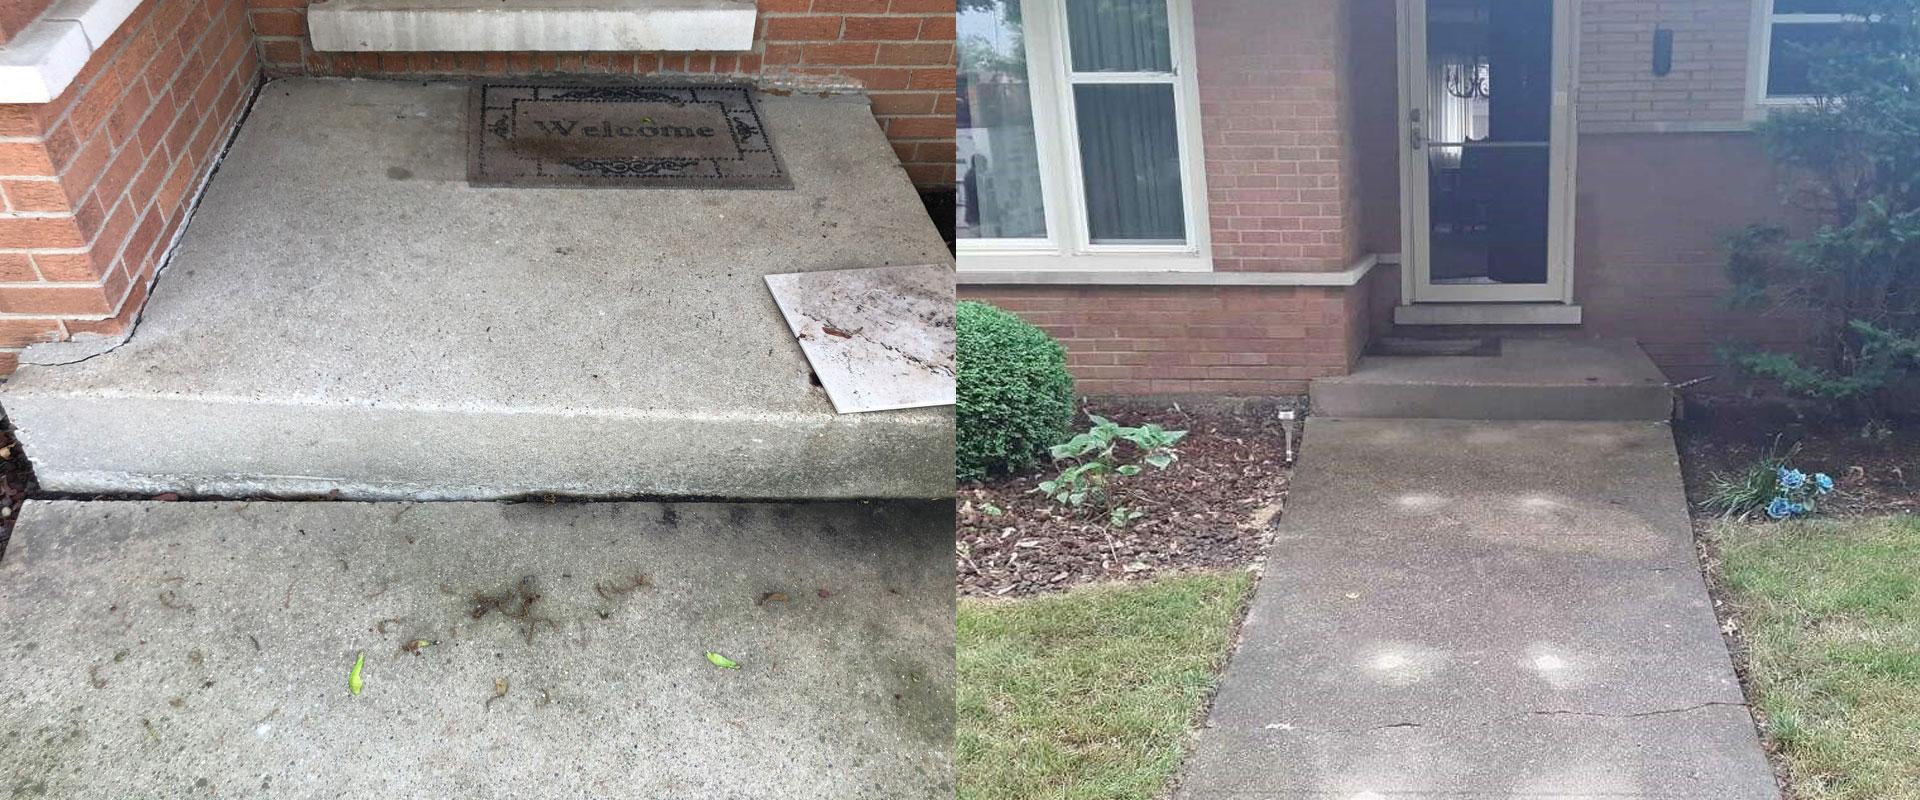 Uneven concrete can be raised